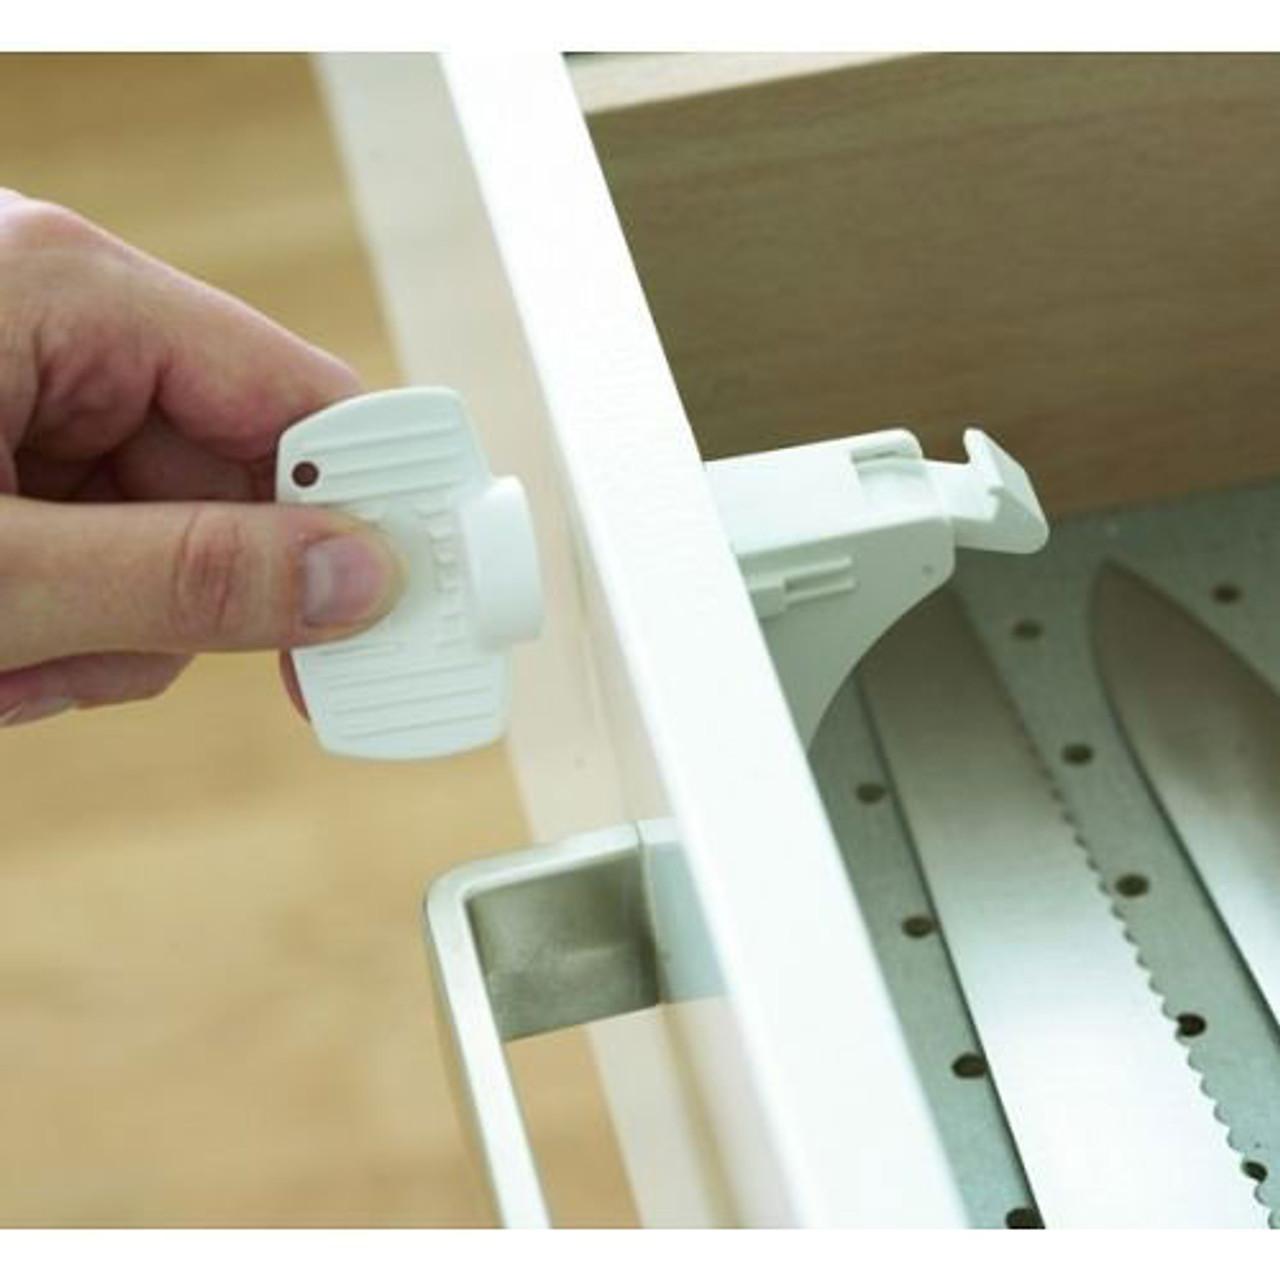 Dreambaby Adhesive Mag Lock Key For Adhesive Mag Locks Child Safety Locks 1 Key